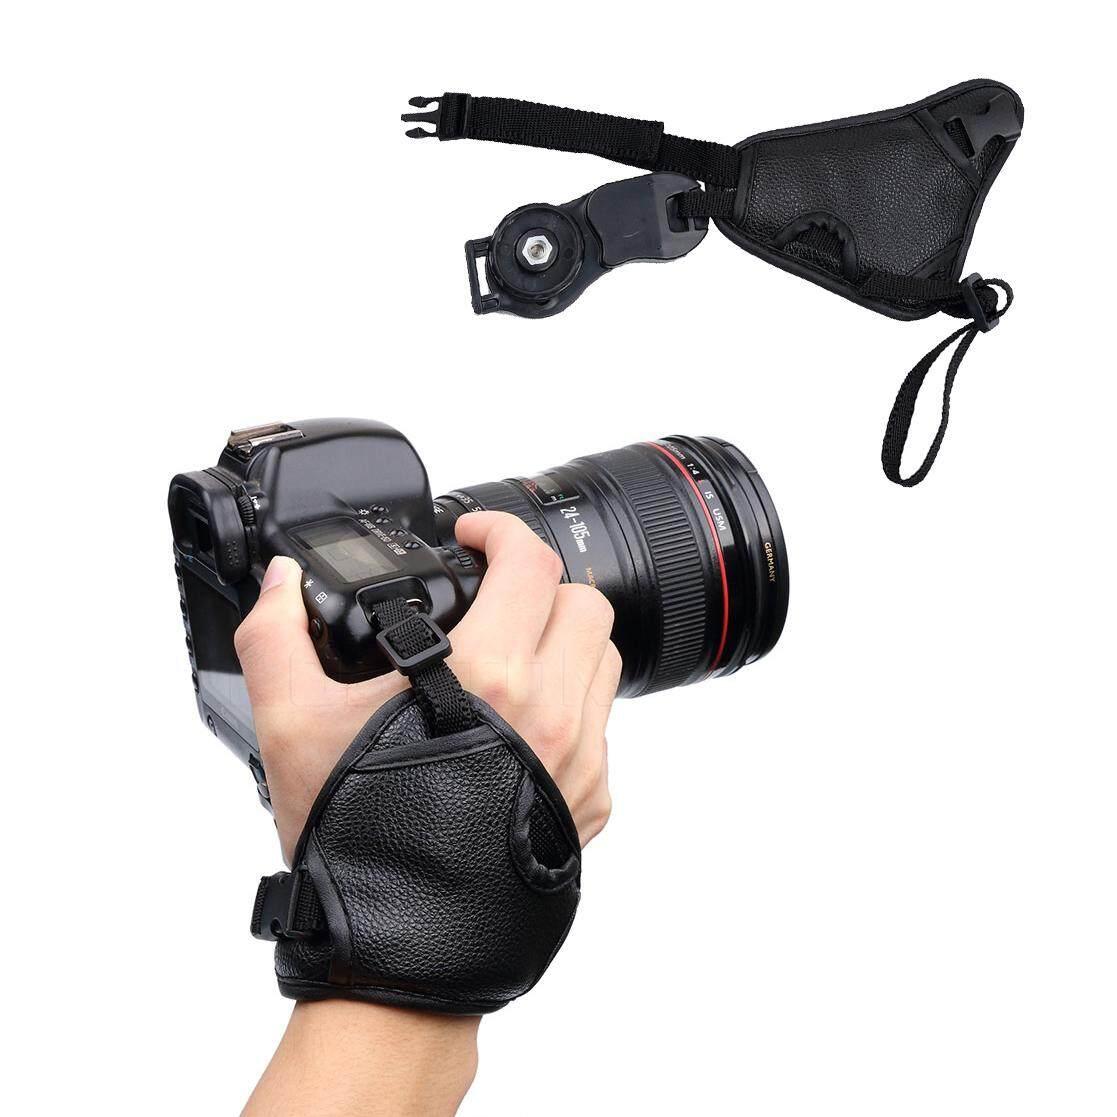 Pu Leather Soft Camera Hand Wrist Strap Grip For Nikon D7100 D5500 D5300 D3300 D610 For Canon Sony Slr/dslr Camera By Kobeton Technology.